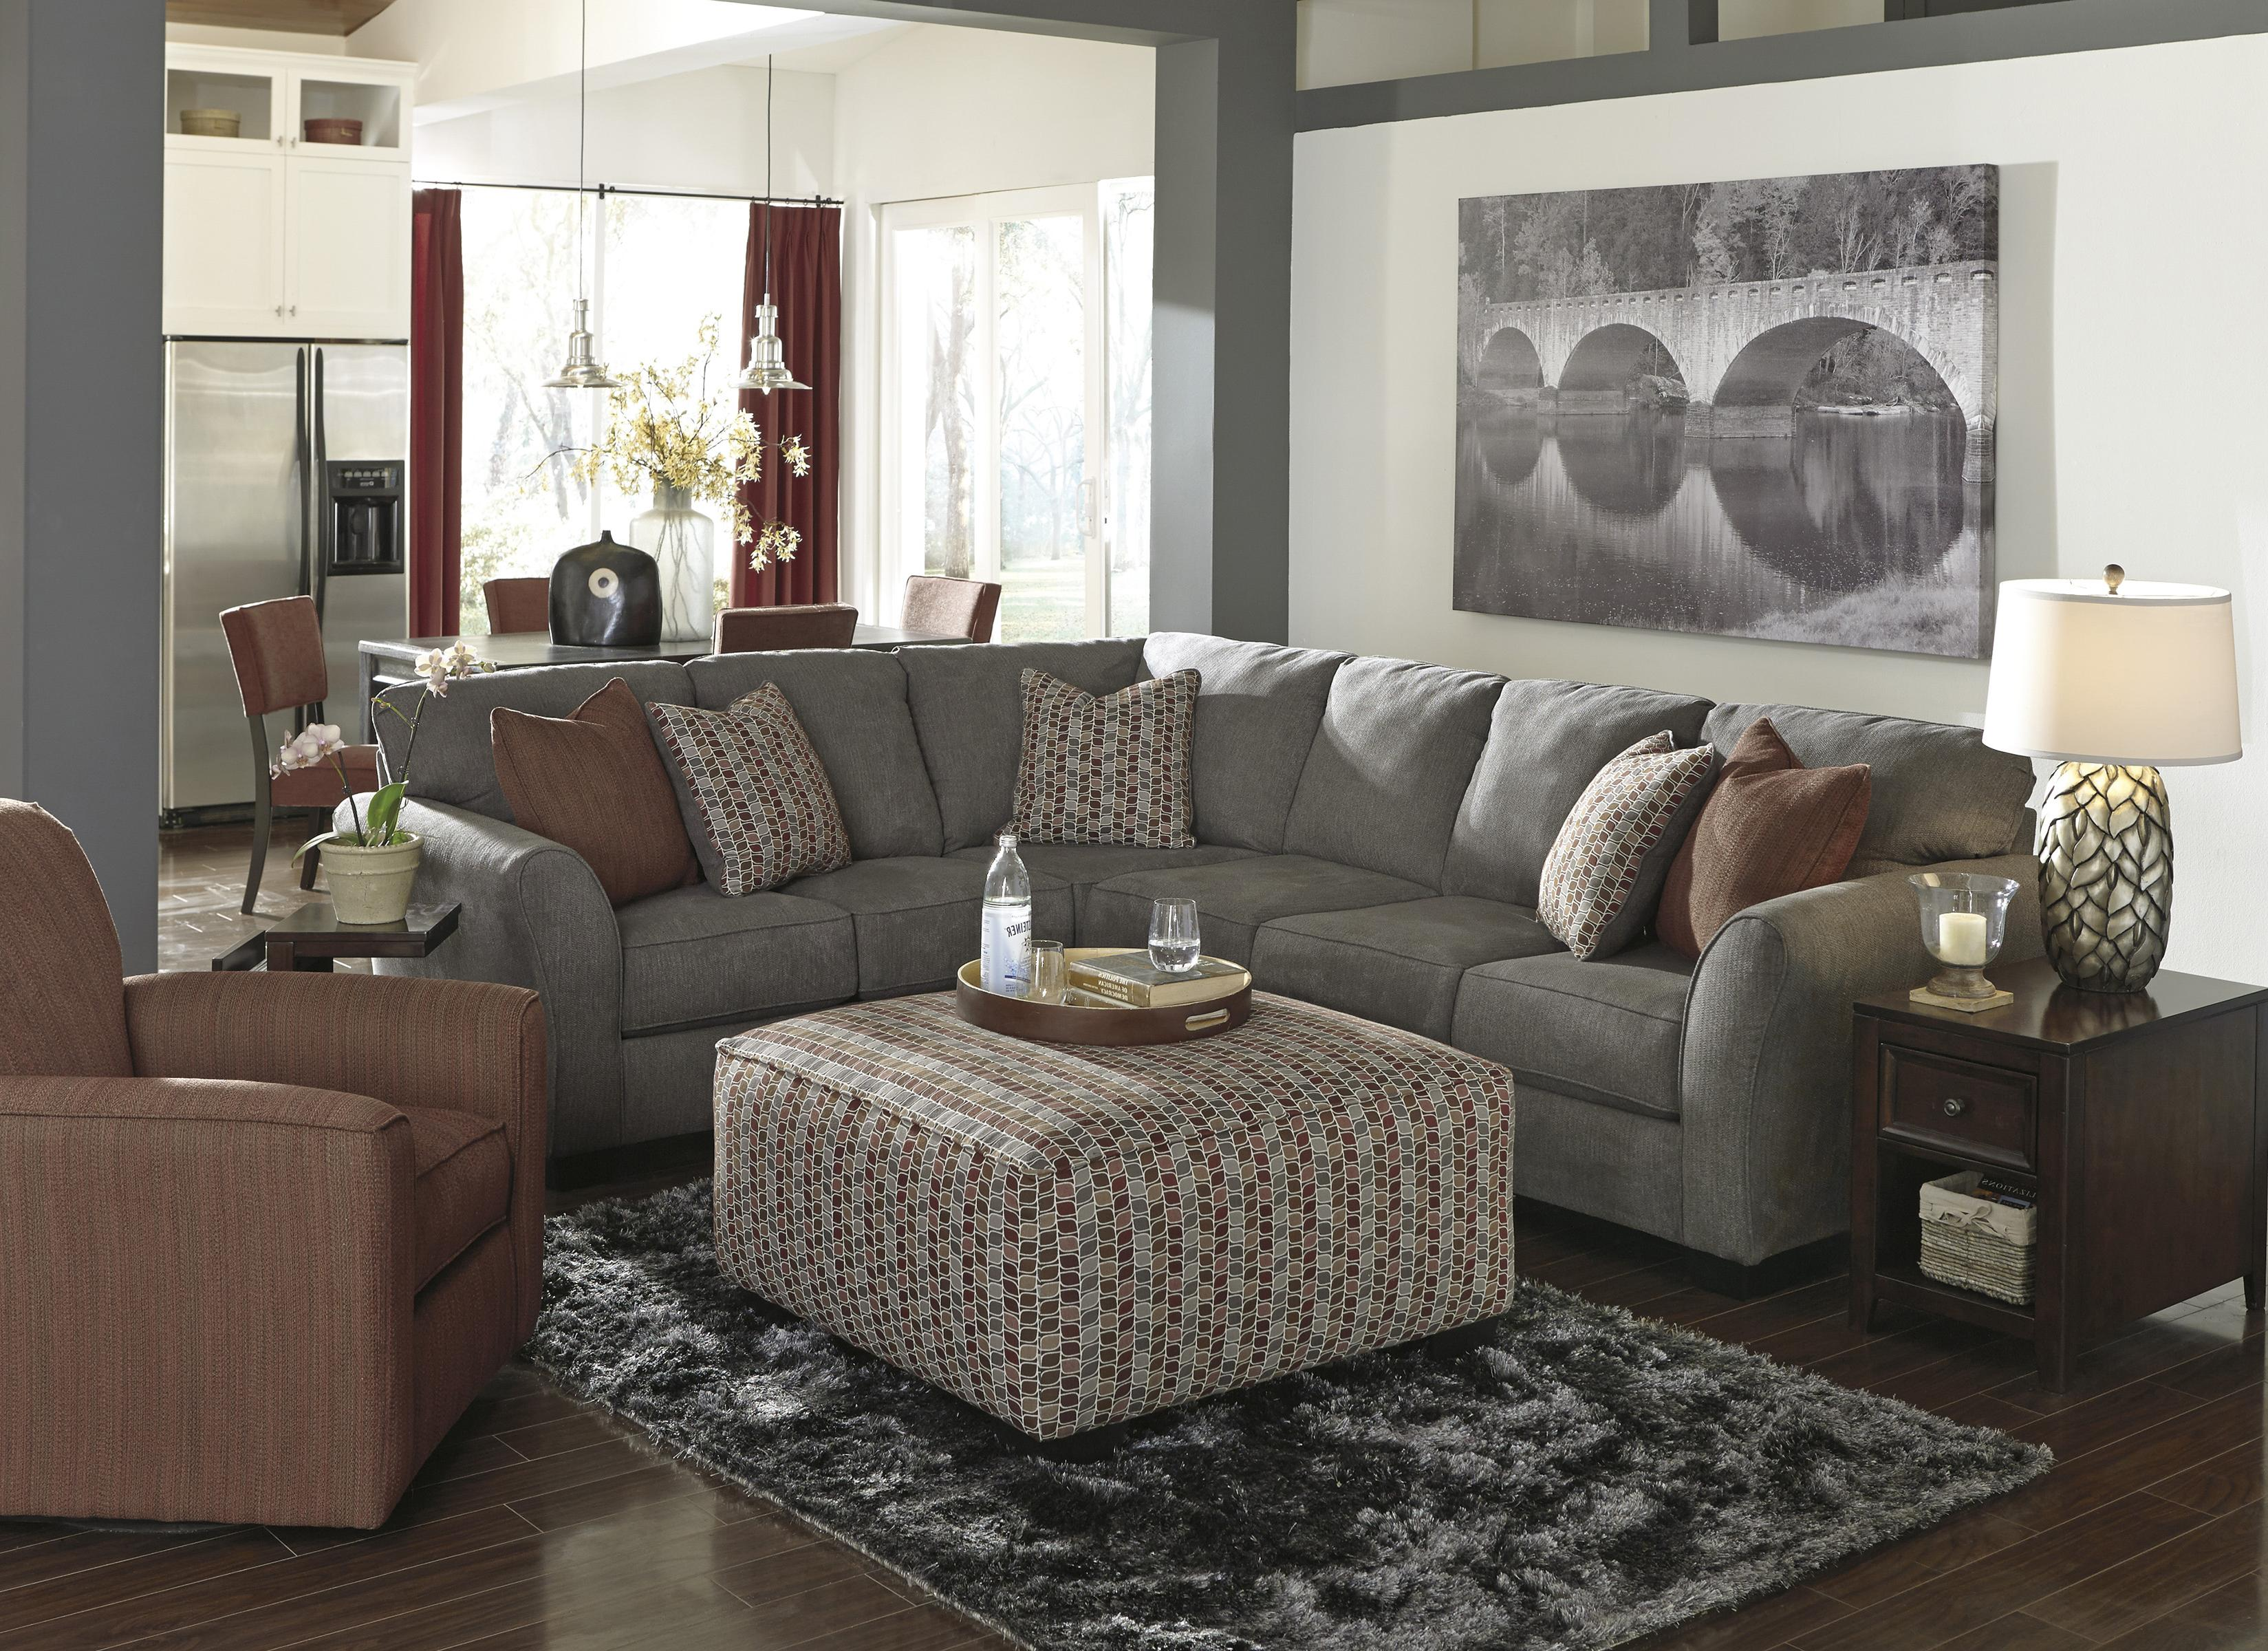 Benchcraft Doralin - Steel Stationary Living Room Group - Item Number: 86800 Living Room Group 2